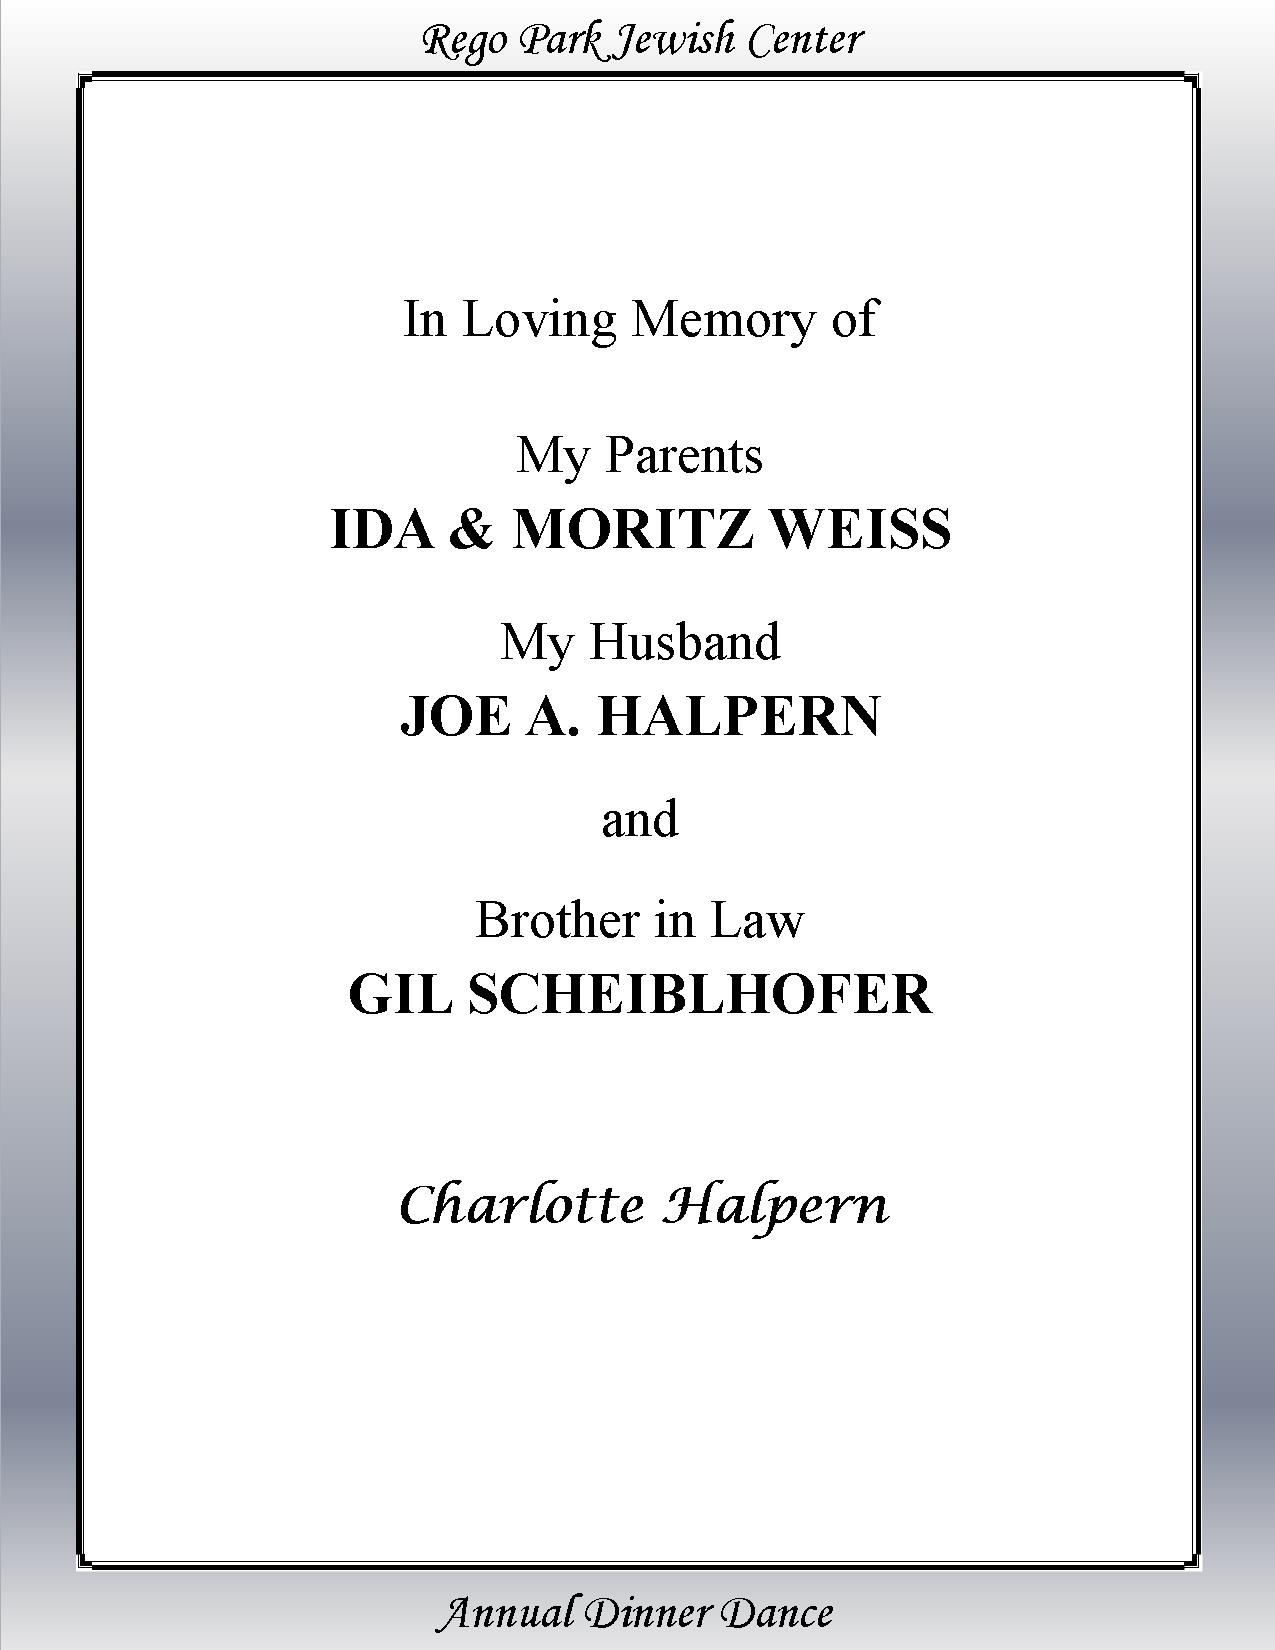 Silver Halpern Memorial page 25 - Copy.jpg